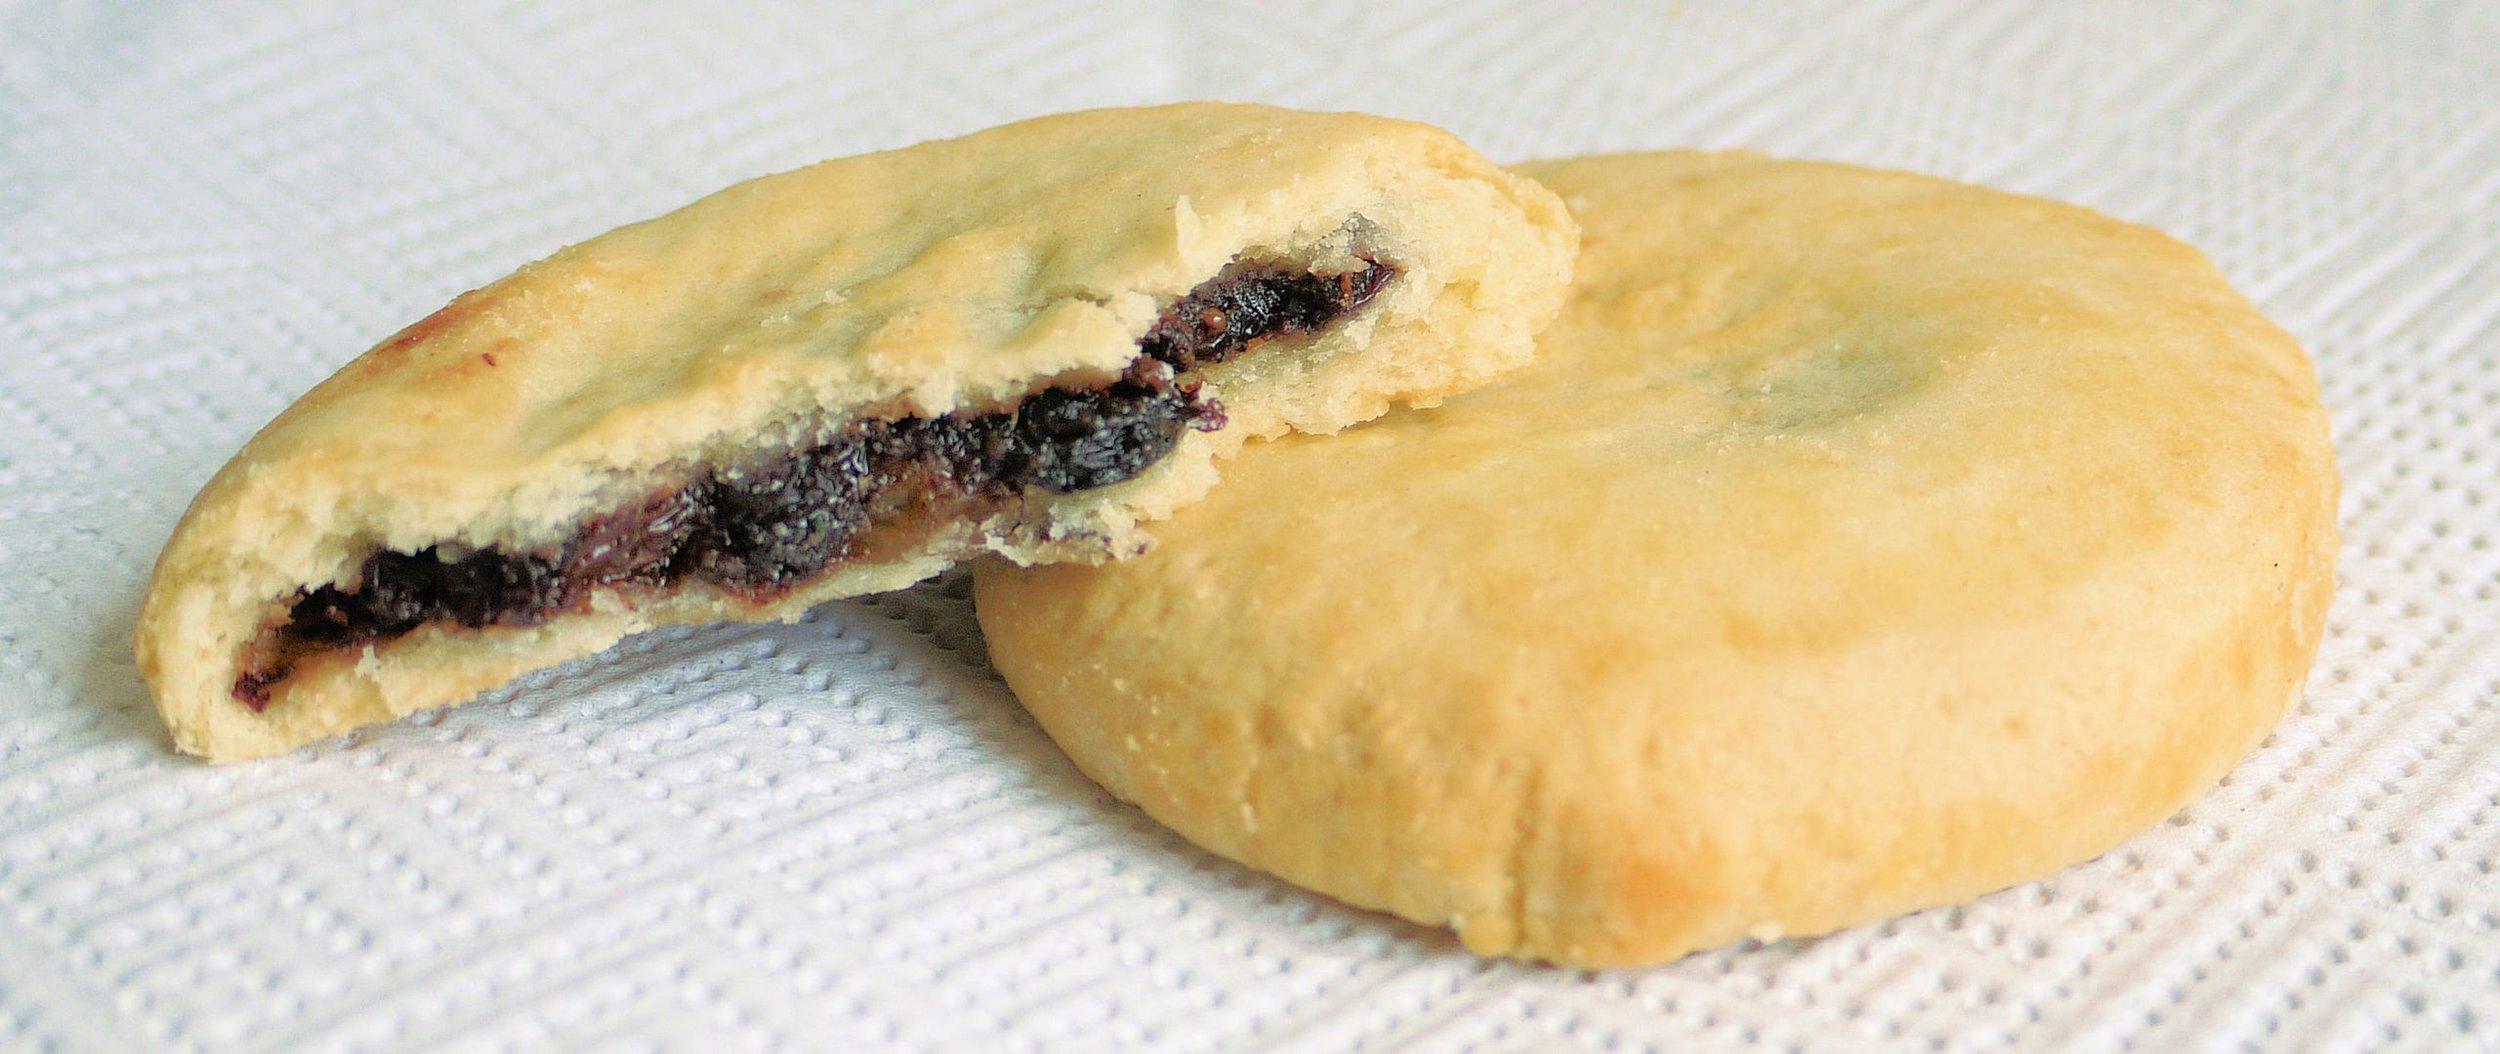 Chorley cake, via Wikipedia